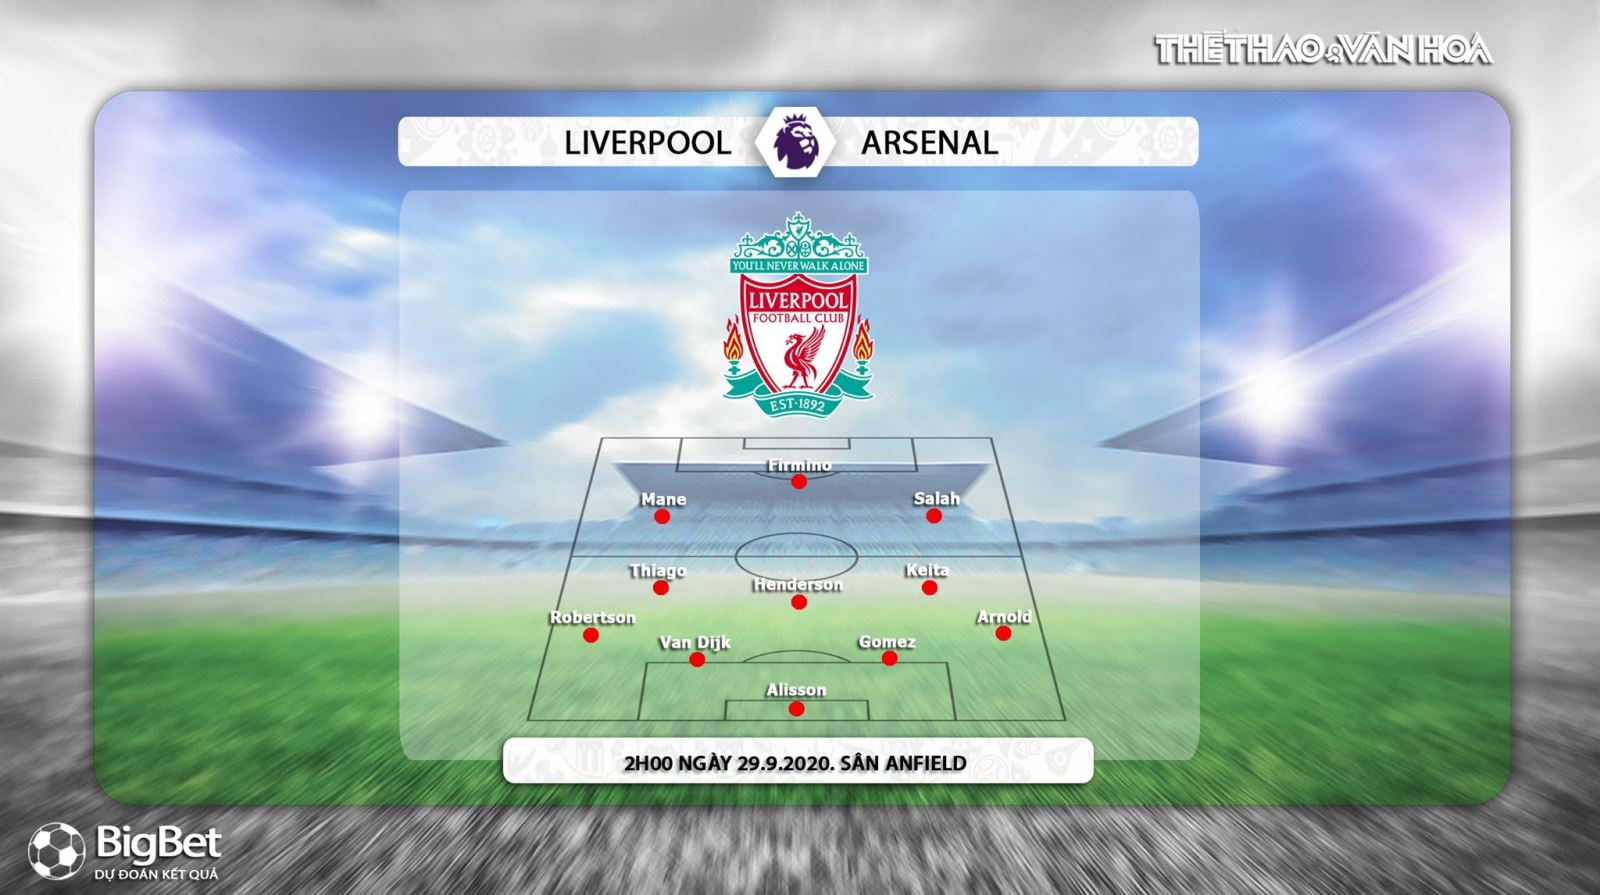 Liverpool vsArsenal, Liverpool, Arseal, trực tiếp bóng đá, bóng đá, soi kèo bóng đá, soi kèo Liverpool vsArsenal, nhận định Liverpool vsArsenal, lịch thi đấu bóng đá